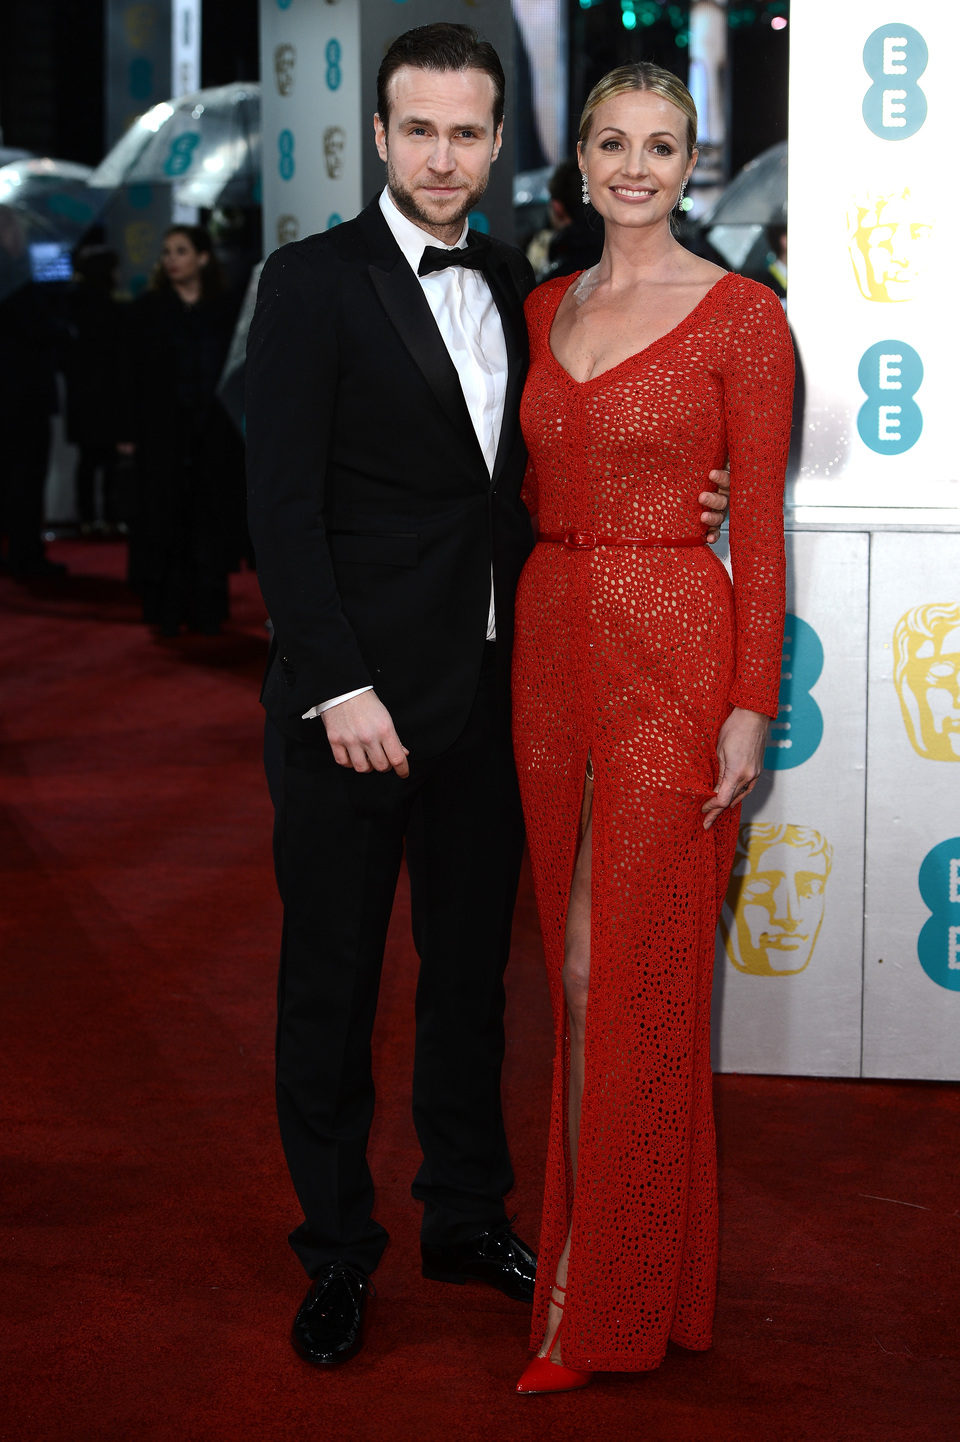 Rafe Spall en los BAFTA 2013